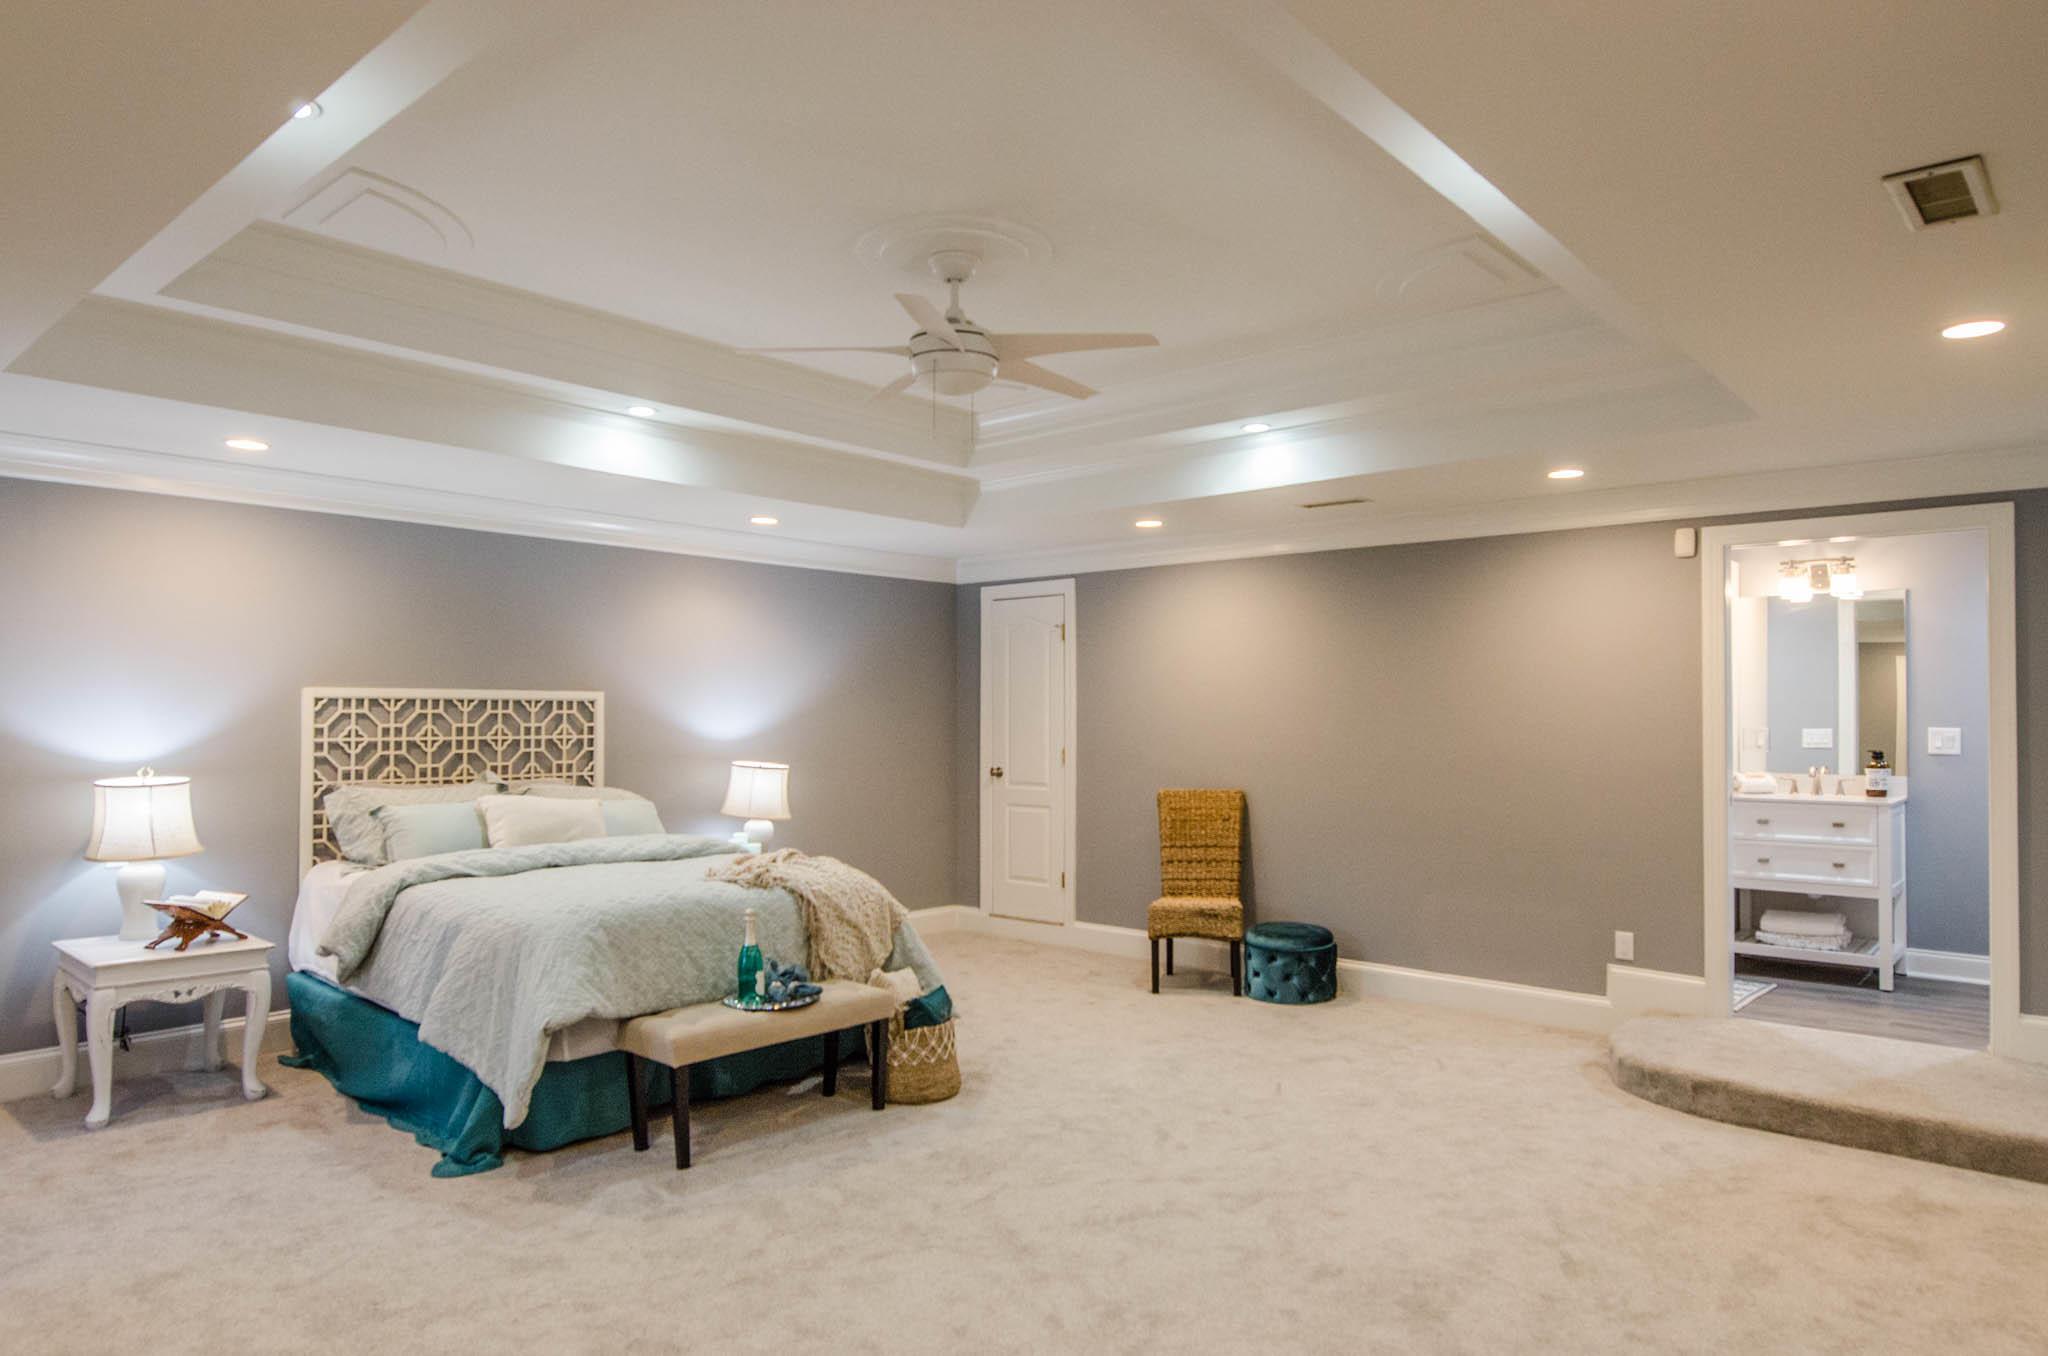 Covington Hills Homes For Sale - 5886 Ryans Bluff, North Charleston, SC - 39